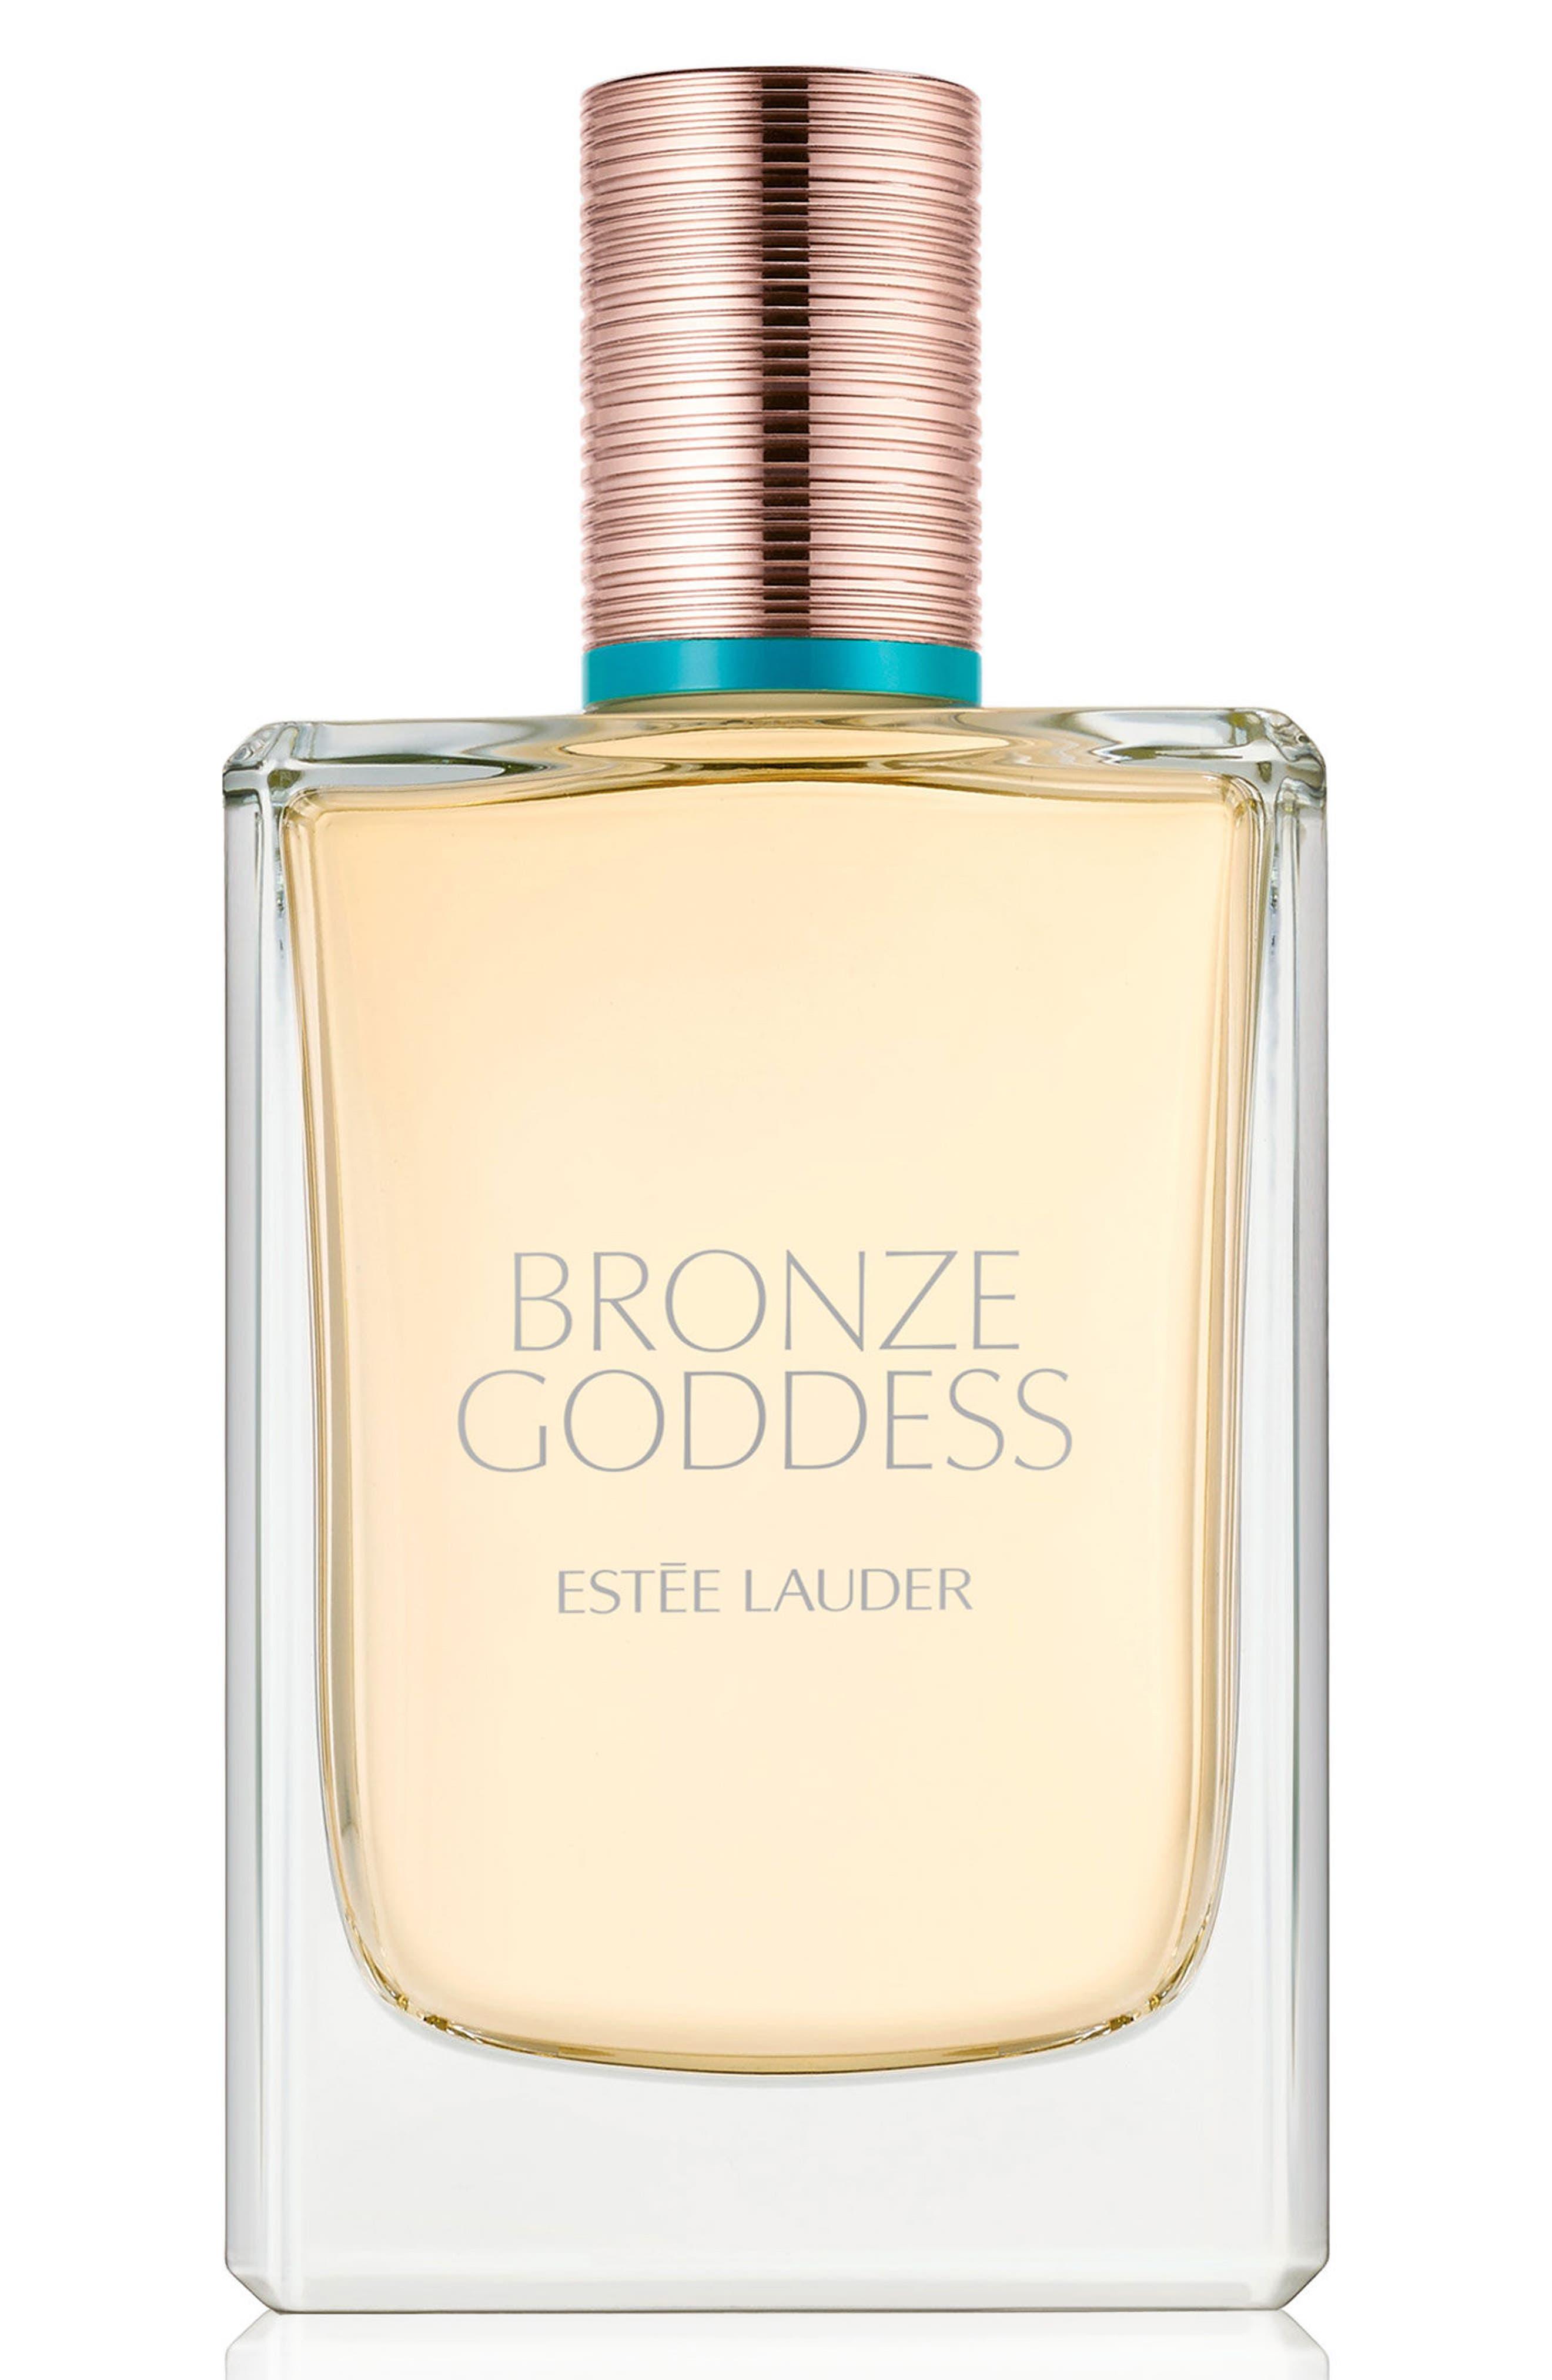 Estée Lauder Bronze Goddess Eau Fraîche Skinscent